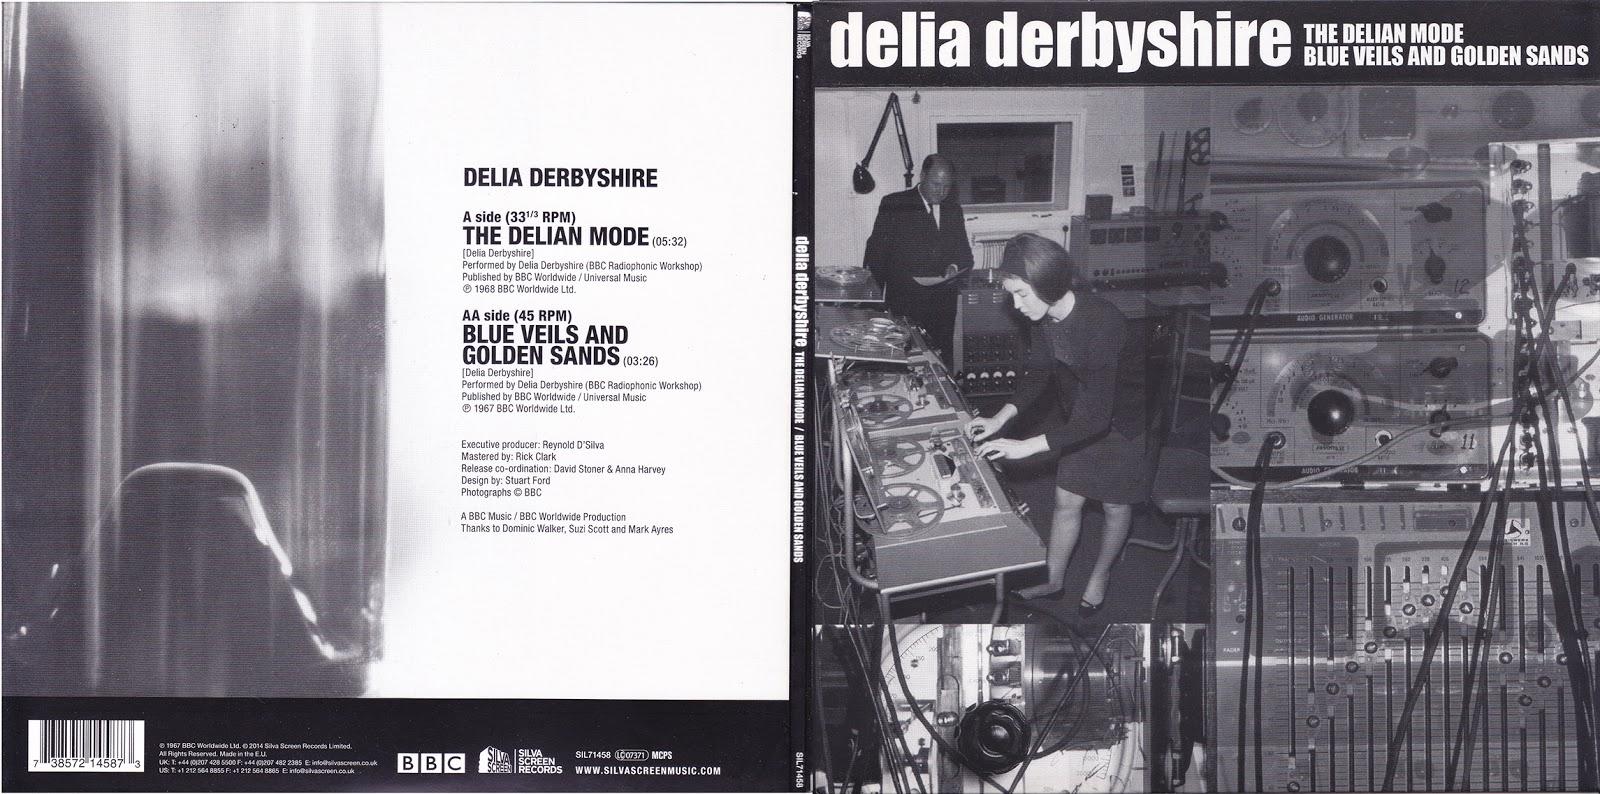 wohnstuben gestaltung : Delia Derbyshire The Delian Mode Blue Veils And Golden Sands 7